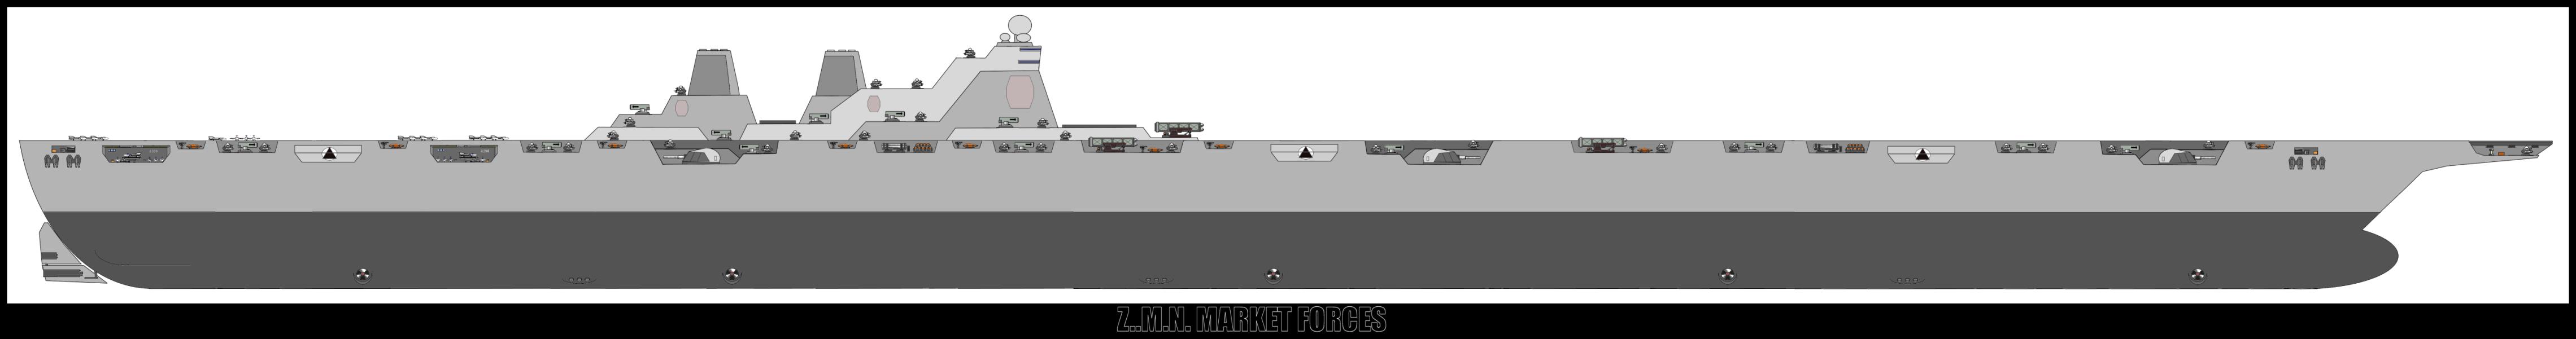 Market Forces Carrier